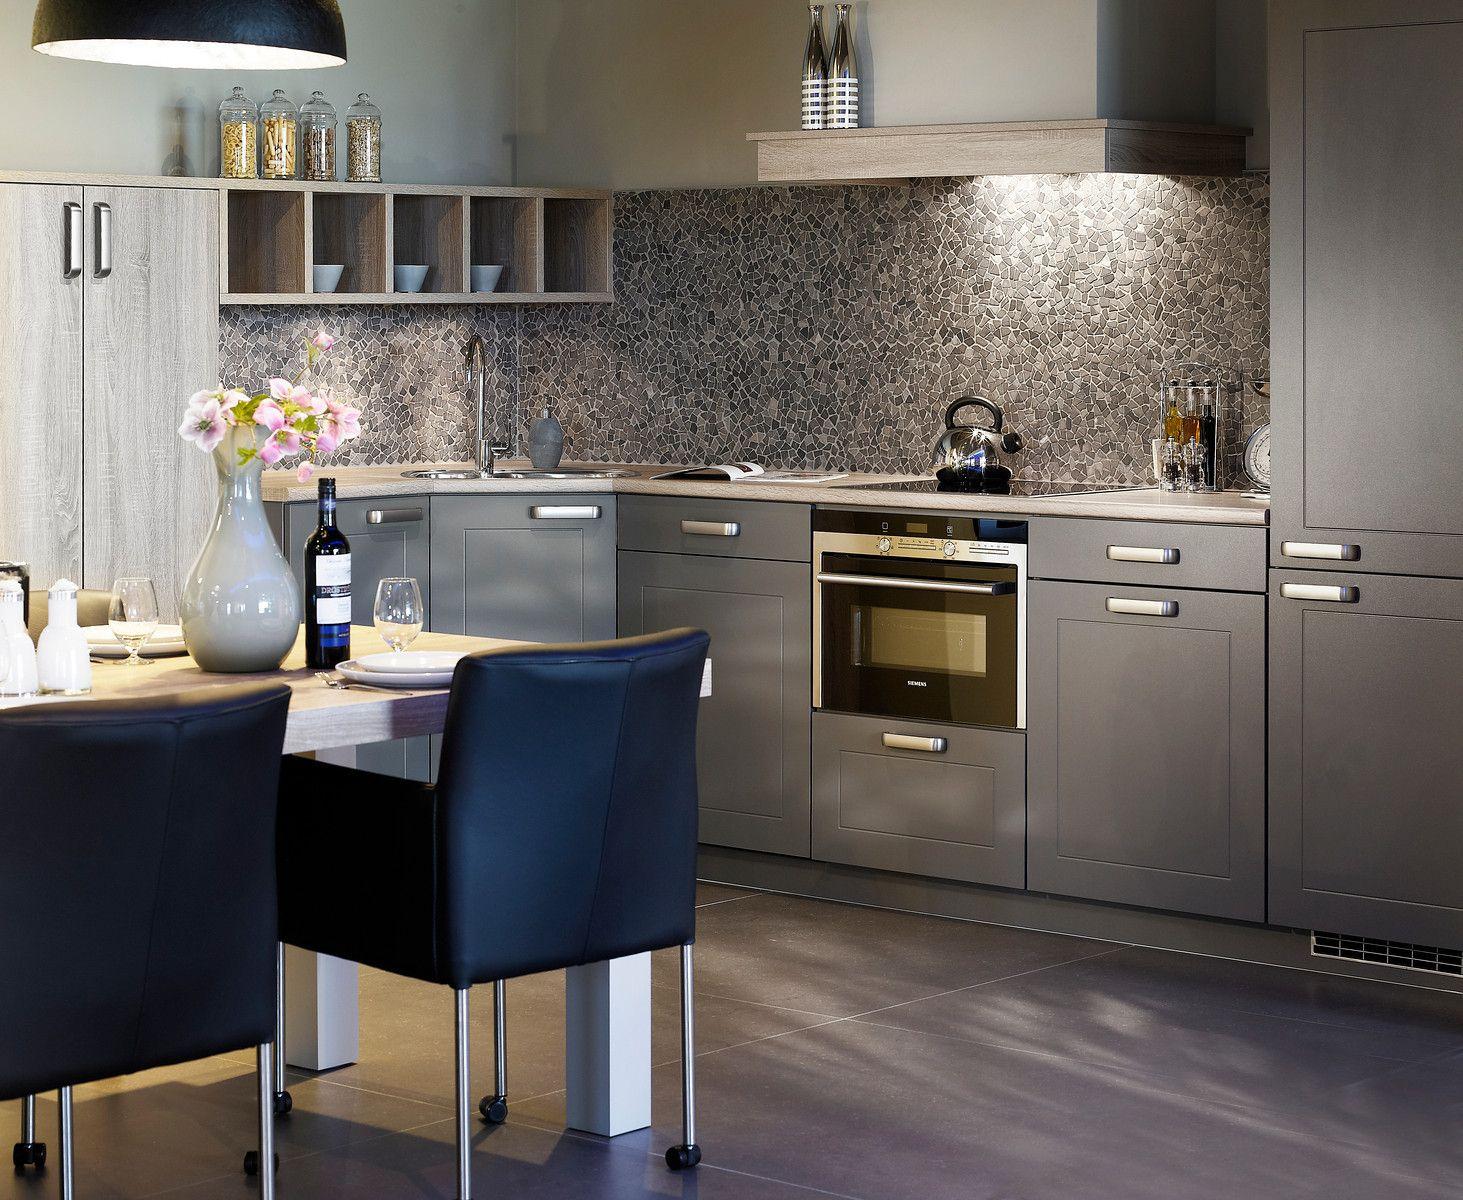 Keukenkasten Keller: Keukenkastjes: opbergruimte, uiterlijk en ...